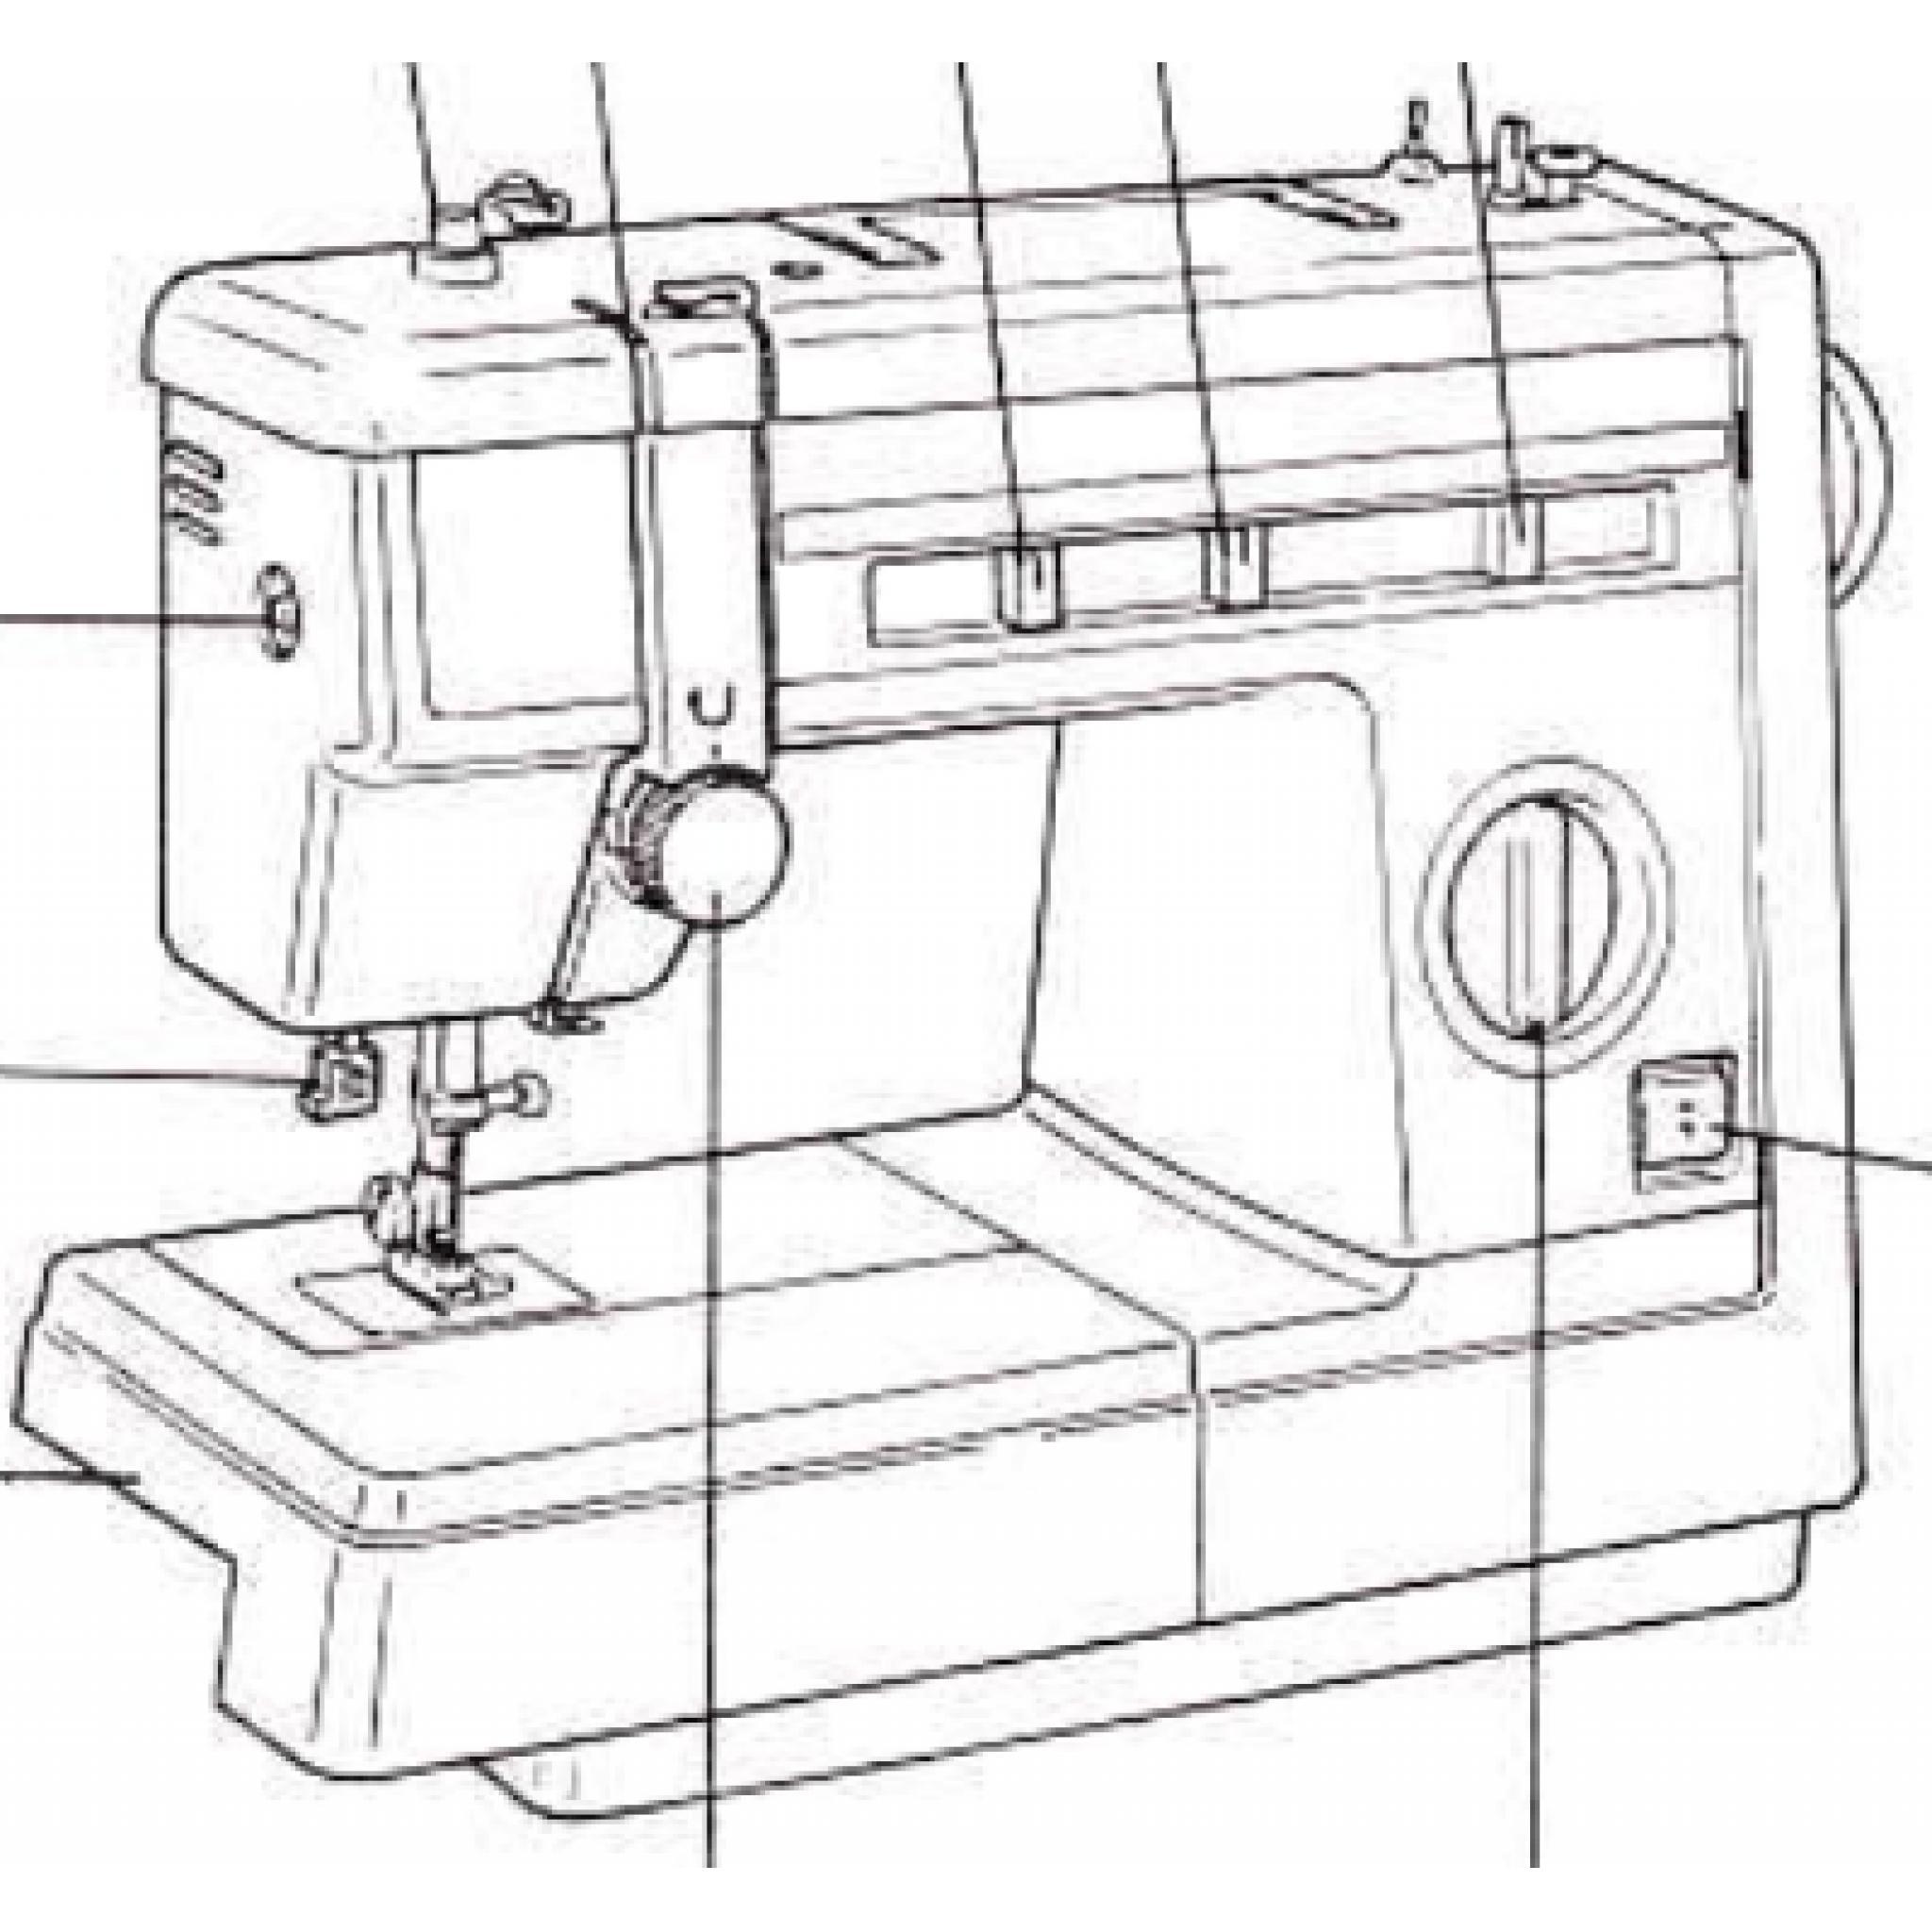 JONES BROTHER Model VX2080 & VX2083 Sewing Machine